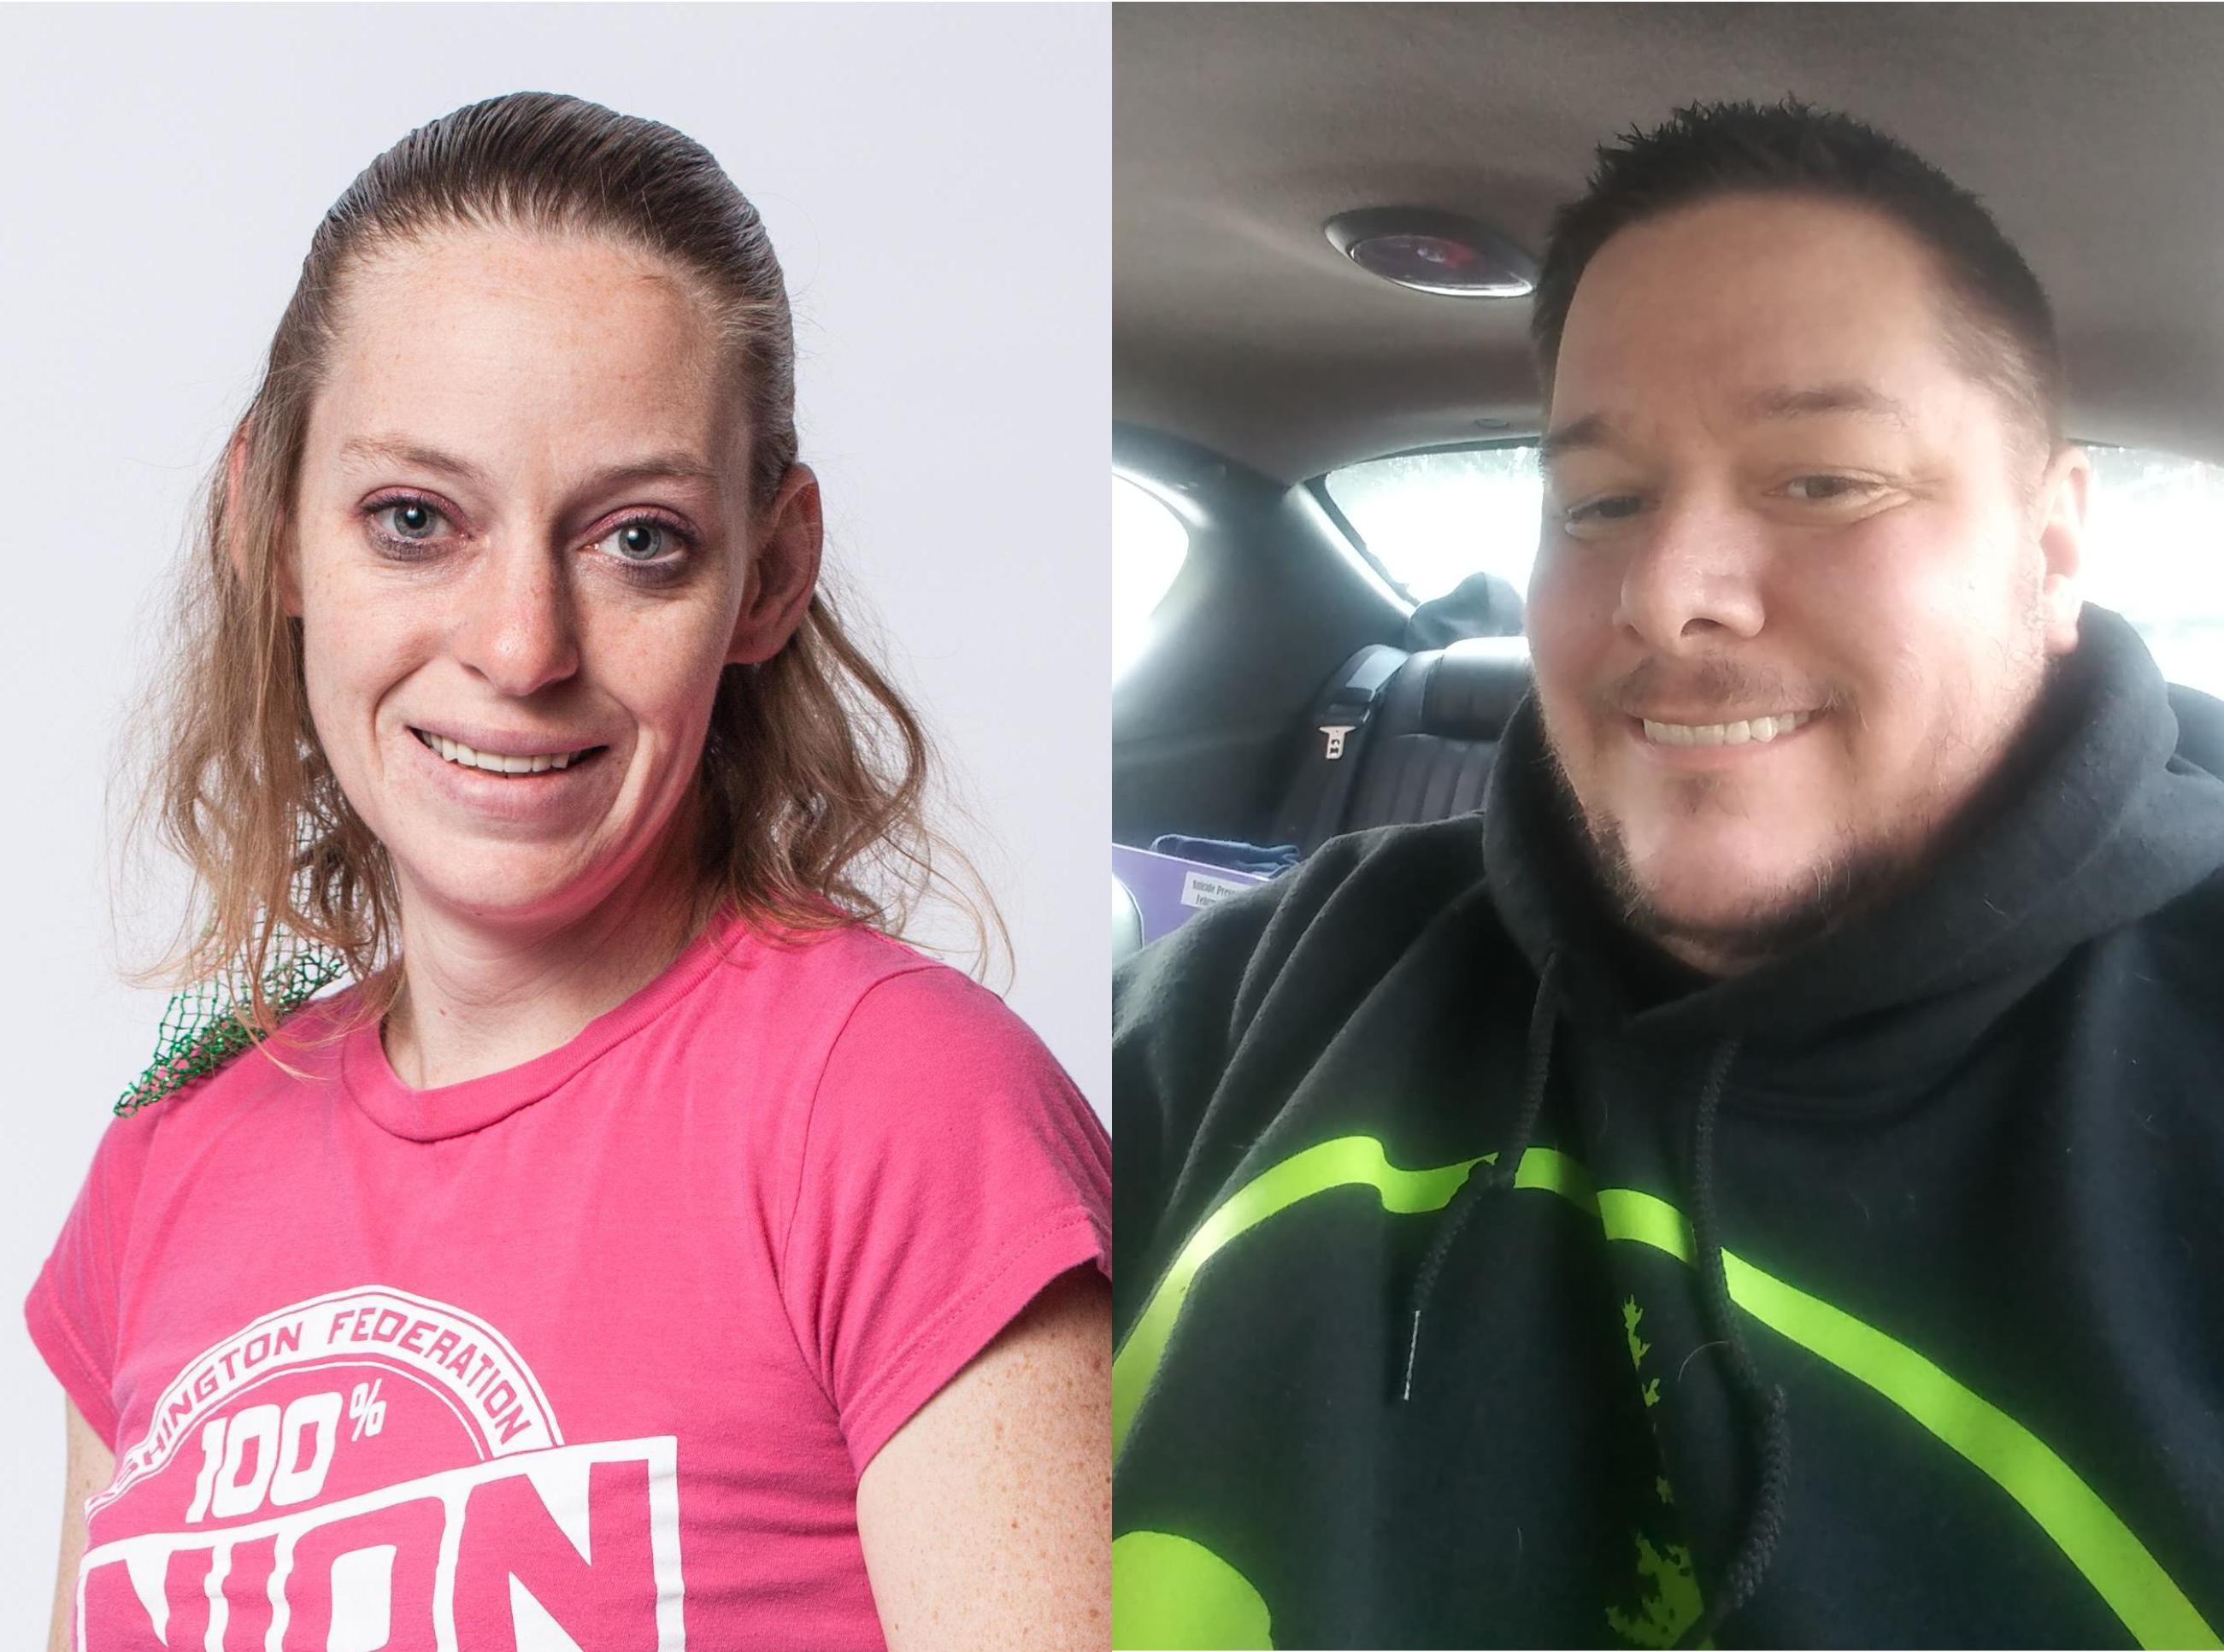 2020 WFSE Steward Award Winners Ashley Fueston and Jason Molzahn